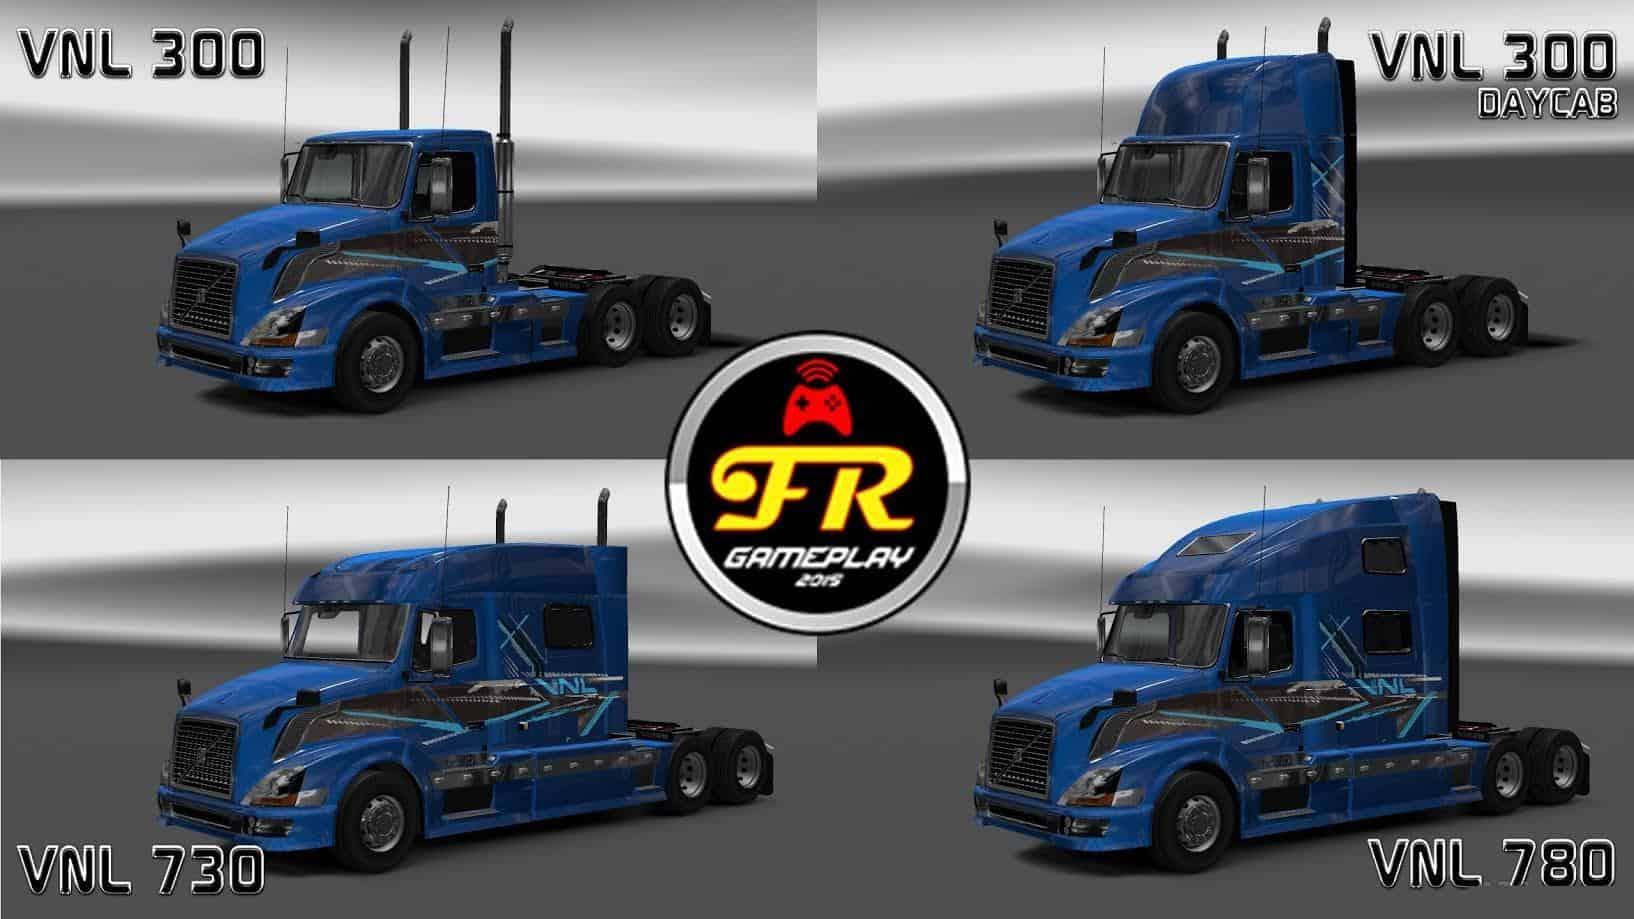 Volvo Vnl Accessories >> VOLVO VNL 780 TRUCK SHOP V3.0 [ATS] 1.6.X BY FRANK BRASIL MOD - American Truck Simulator mod ...